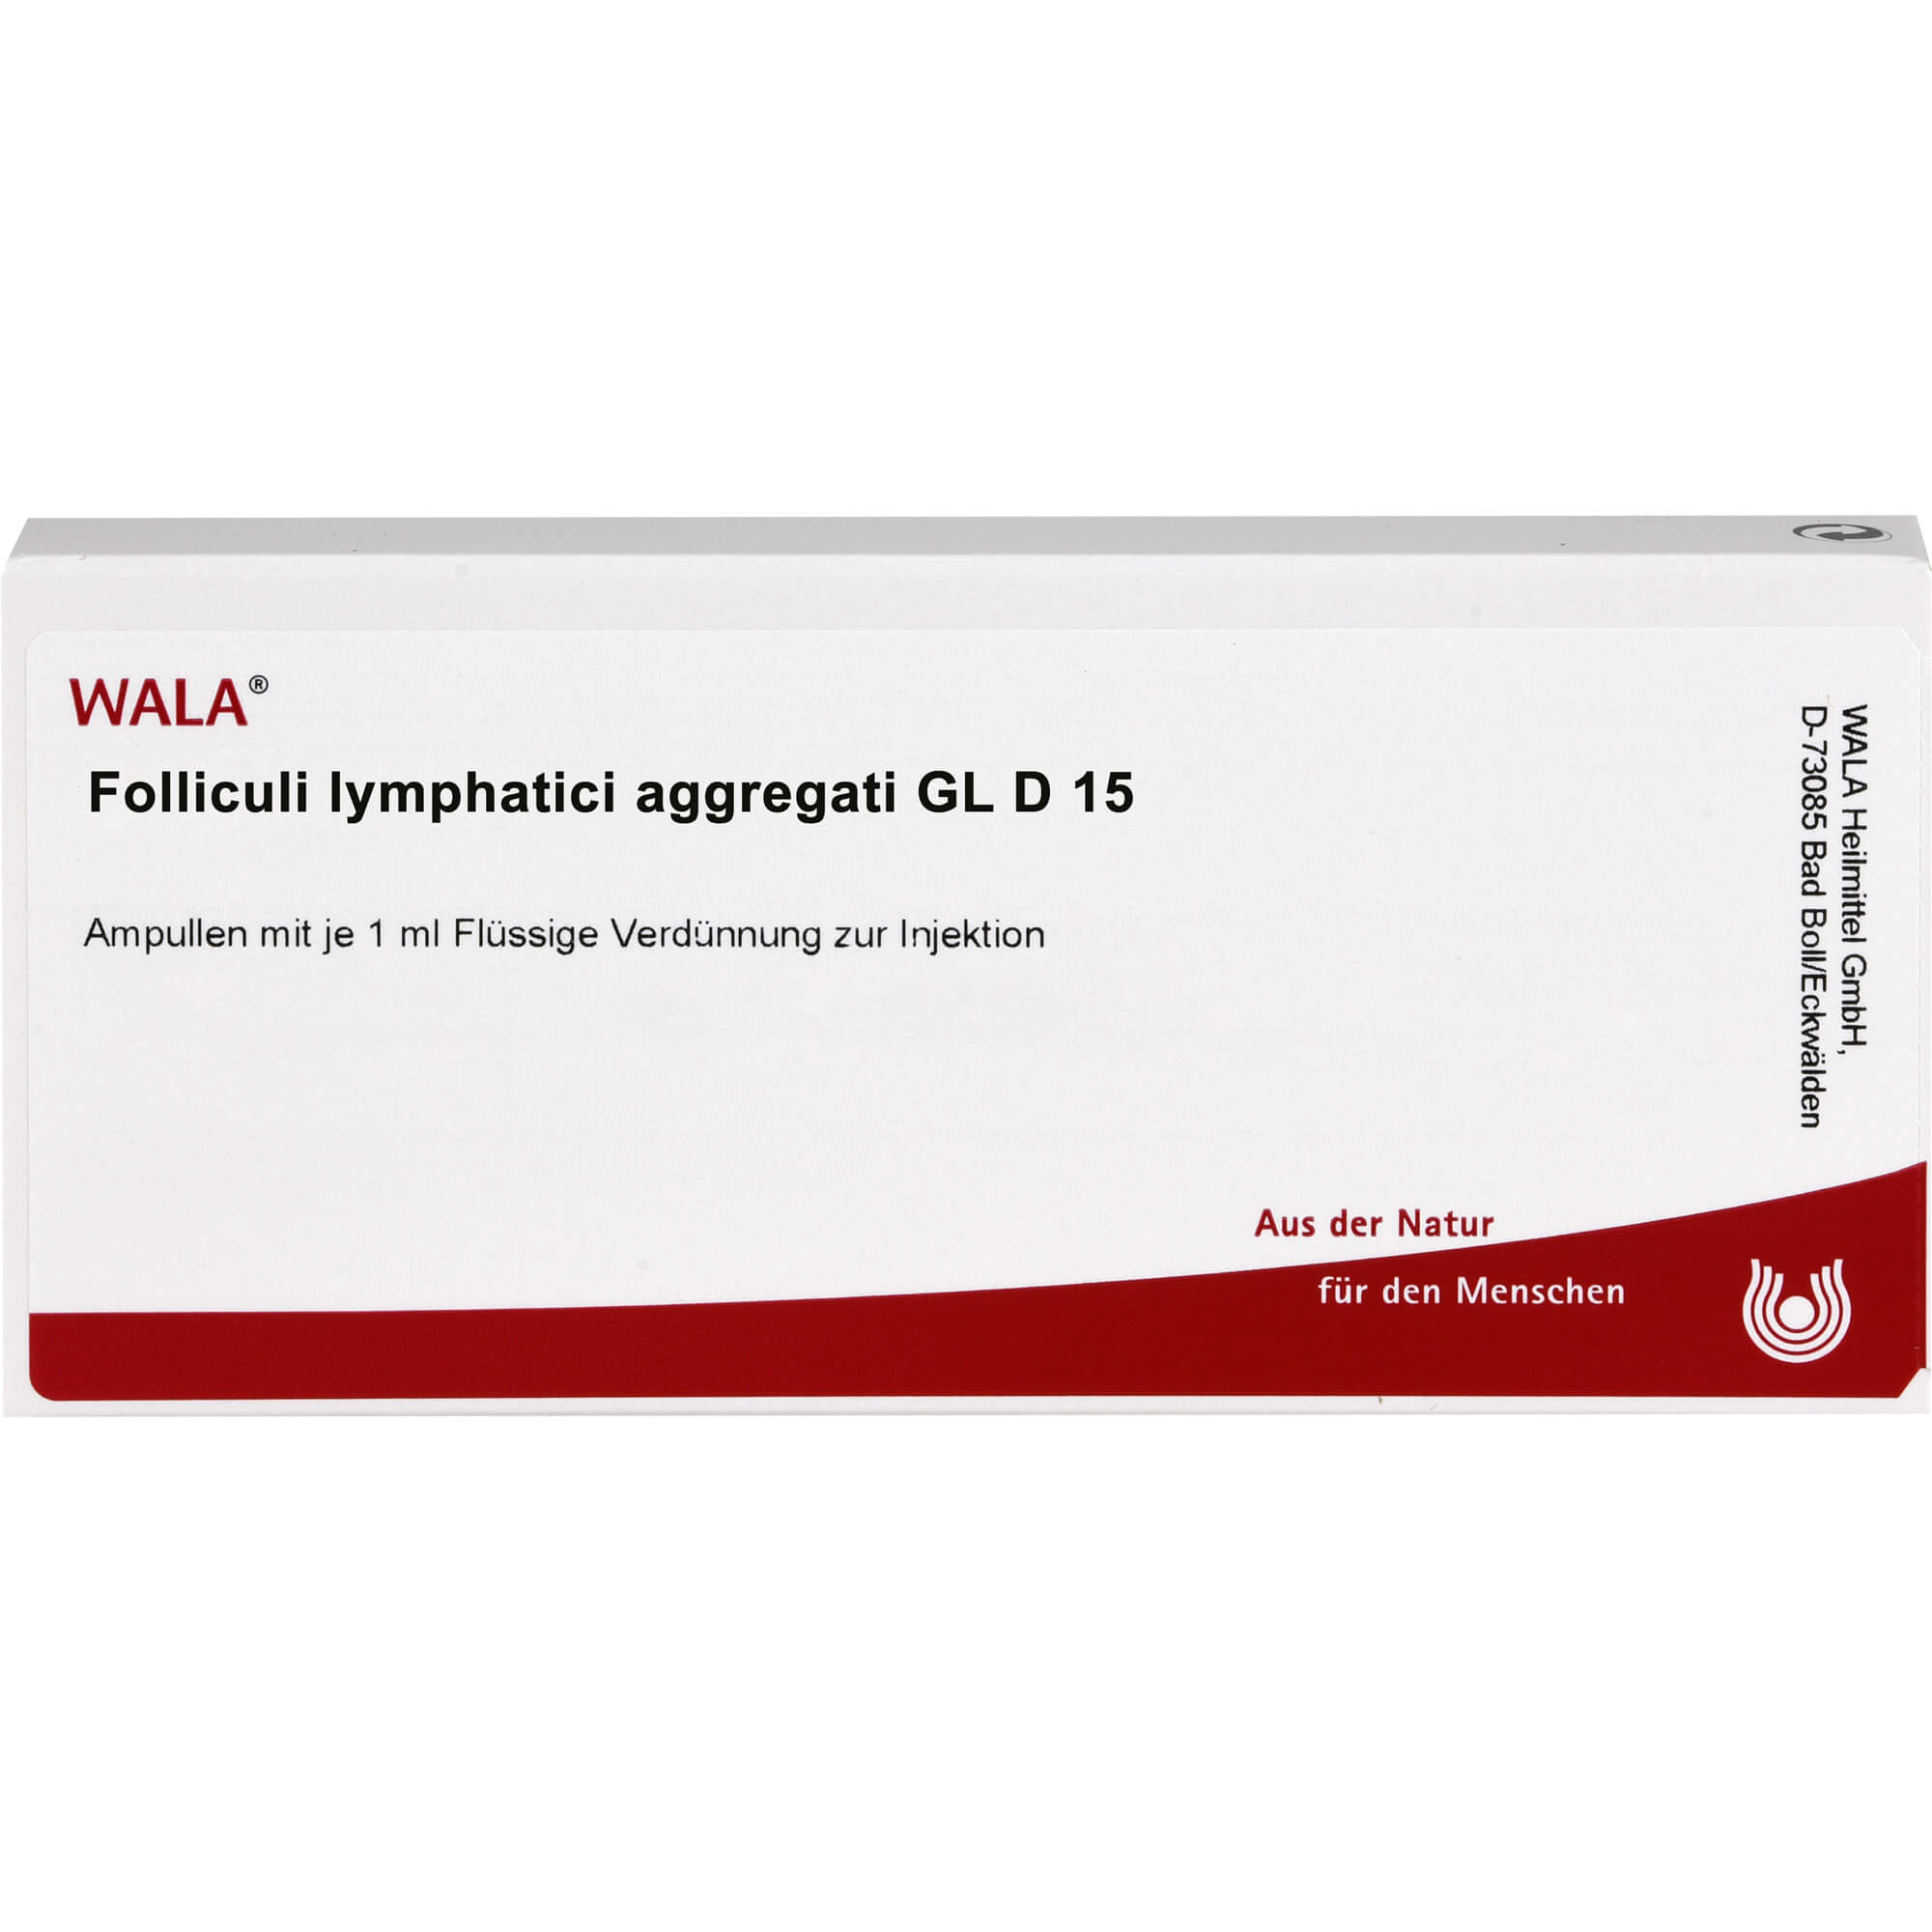 FOLLICULI LYMPHATICI aggregati GL D 15 Ampullen